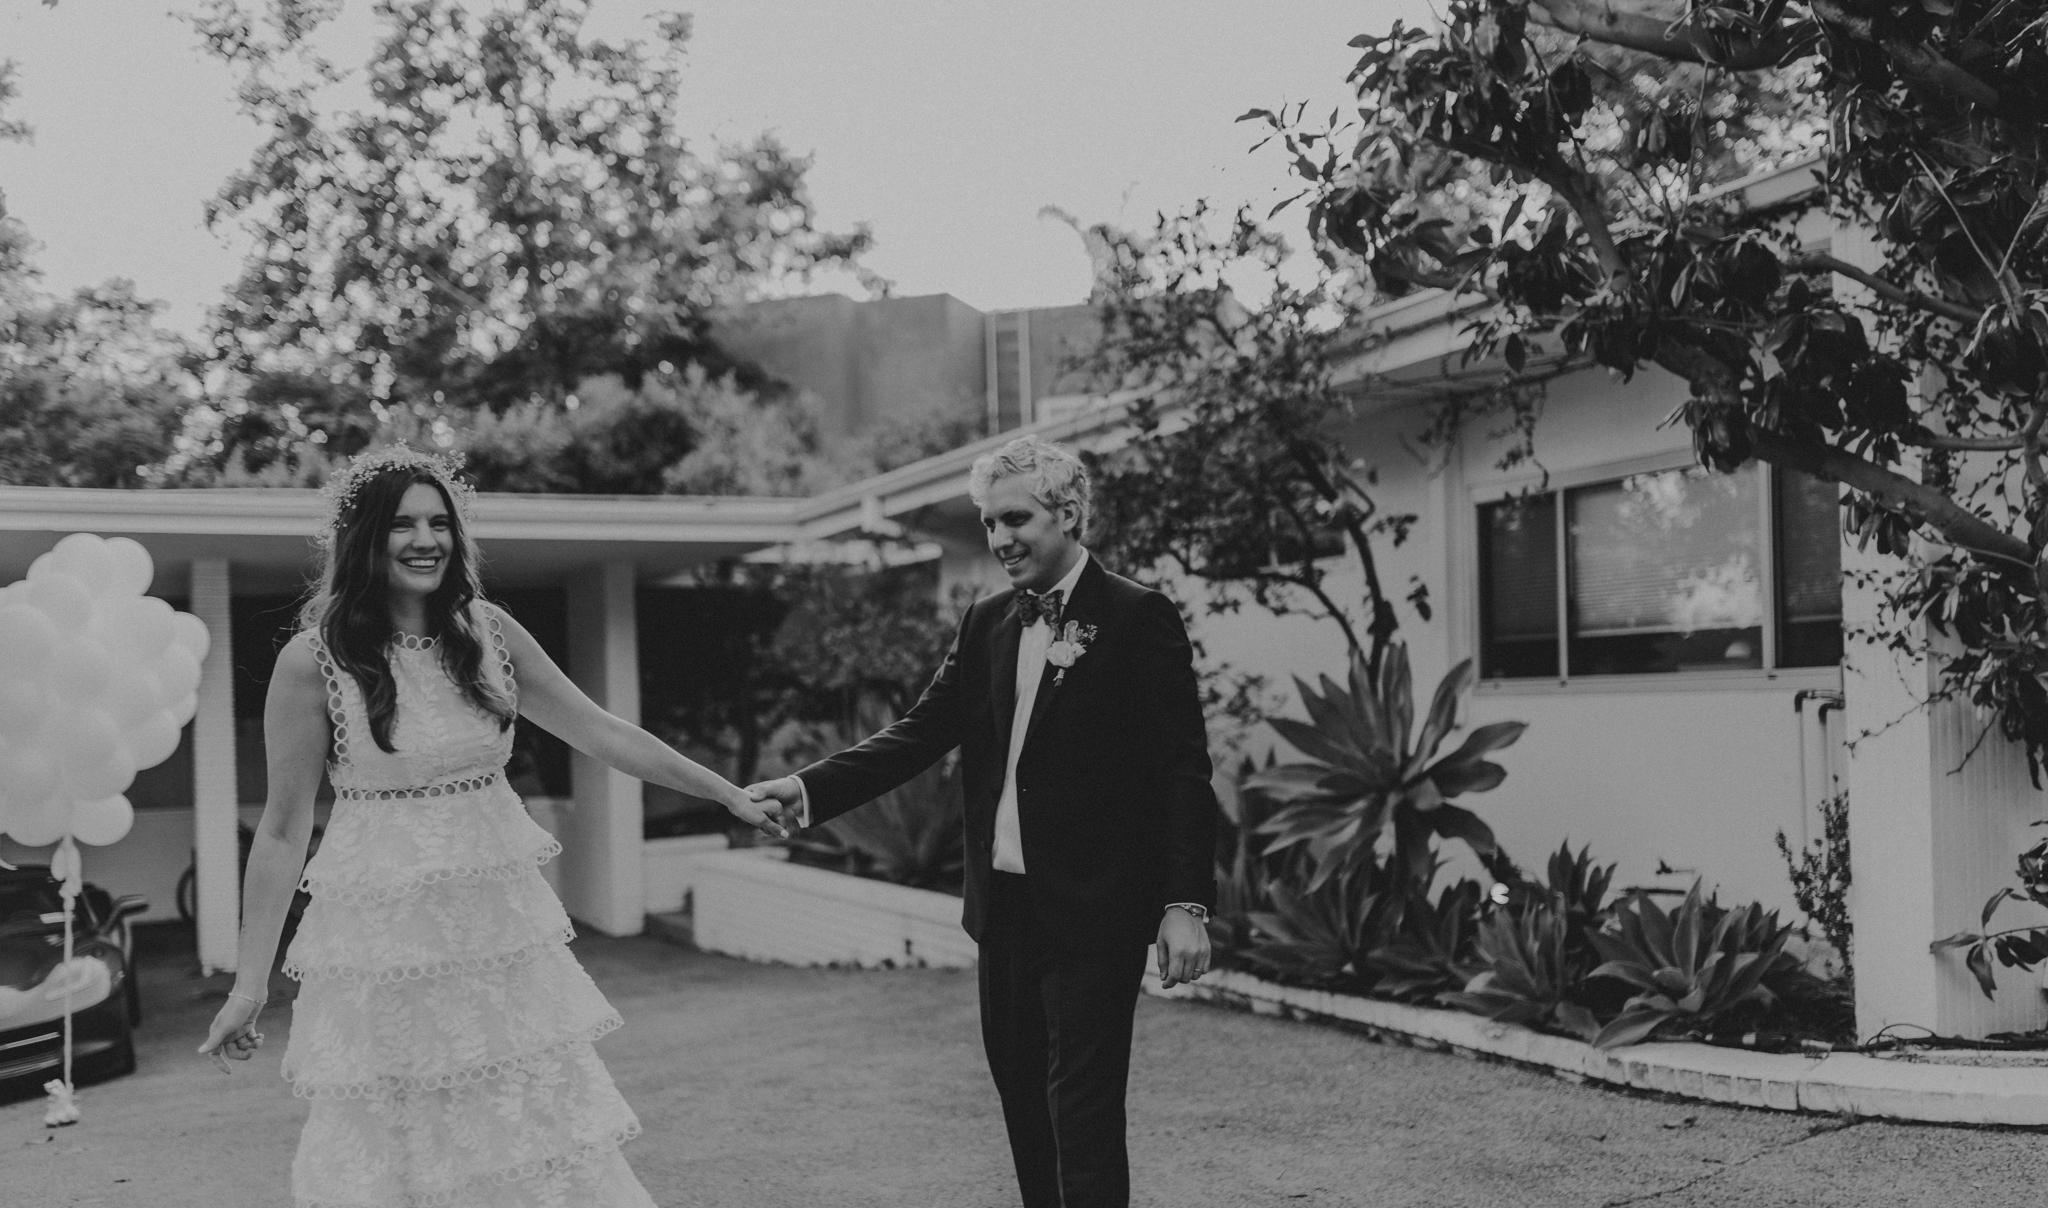 Isaiah + Taylor Photography - Private Estate Backyard Wedding - Beverly Hills - Los Angeles Wedding Photographer - 102.jpg